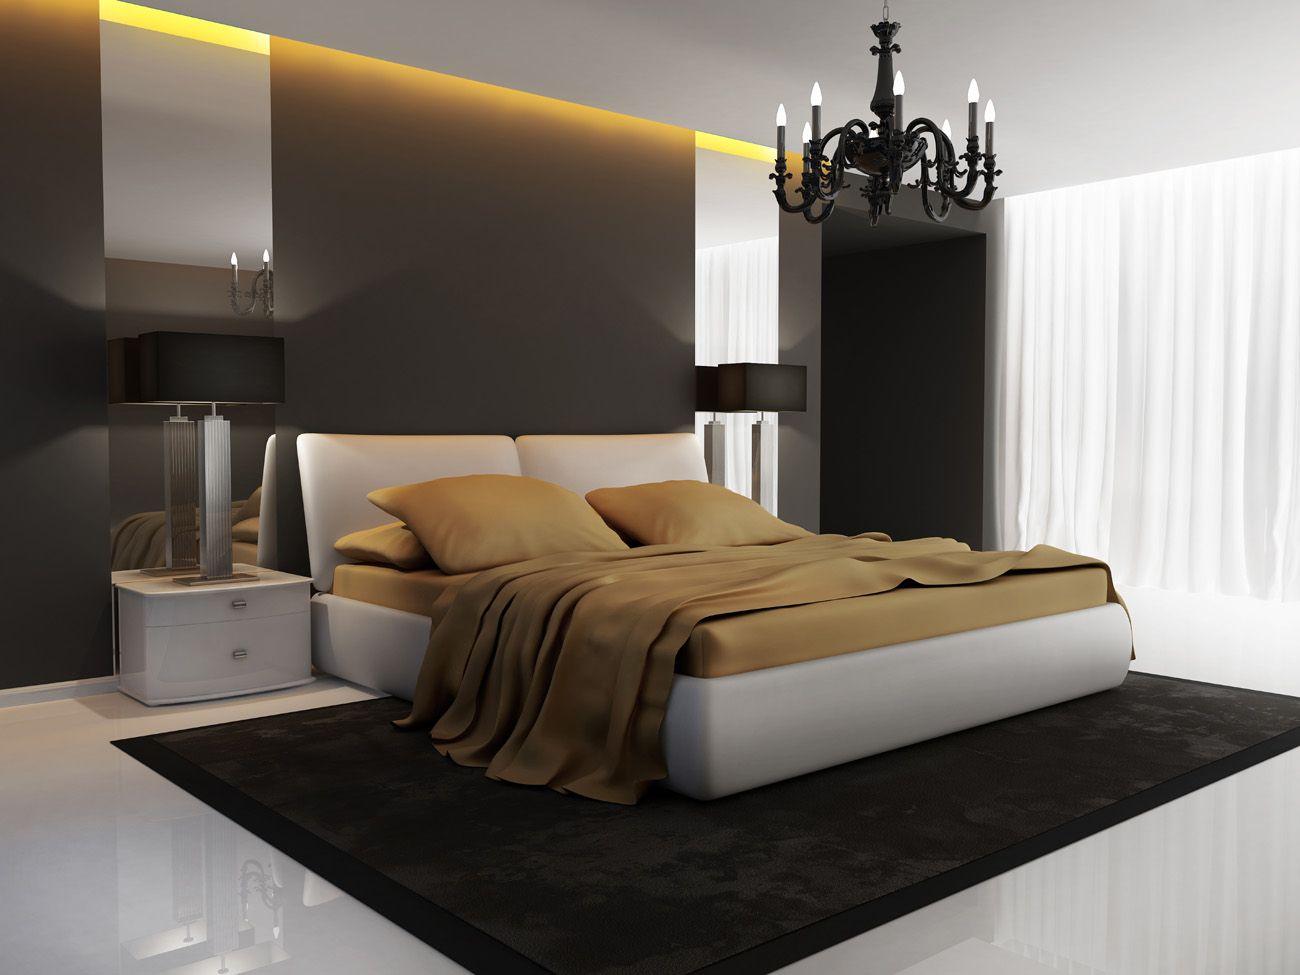 Chic luxury hotel gold black bedroom chandelier perspective chic luxury hotel gold black bedroom chandelier perspective aloadofball Gallery